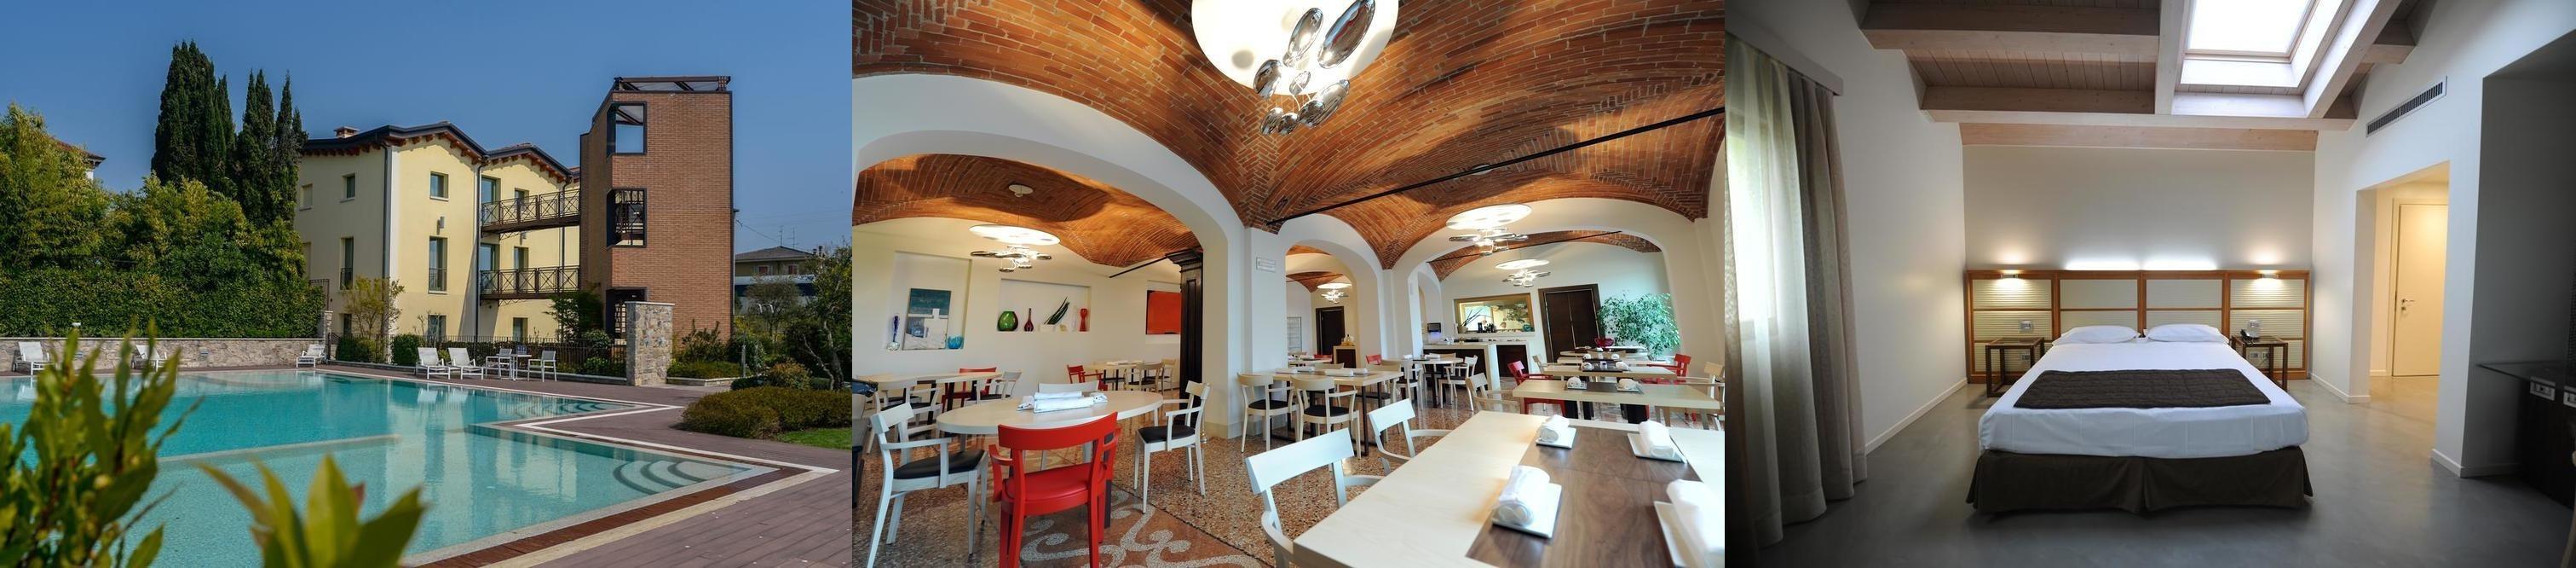 Ziba Hotel & Spa